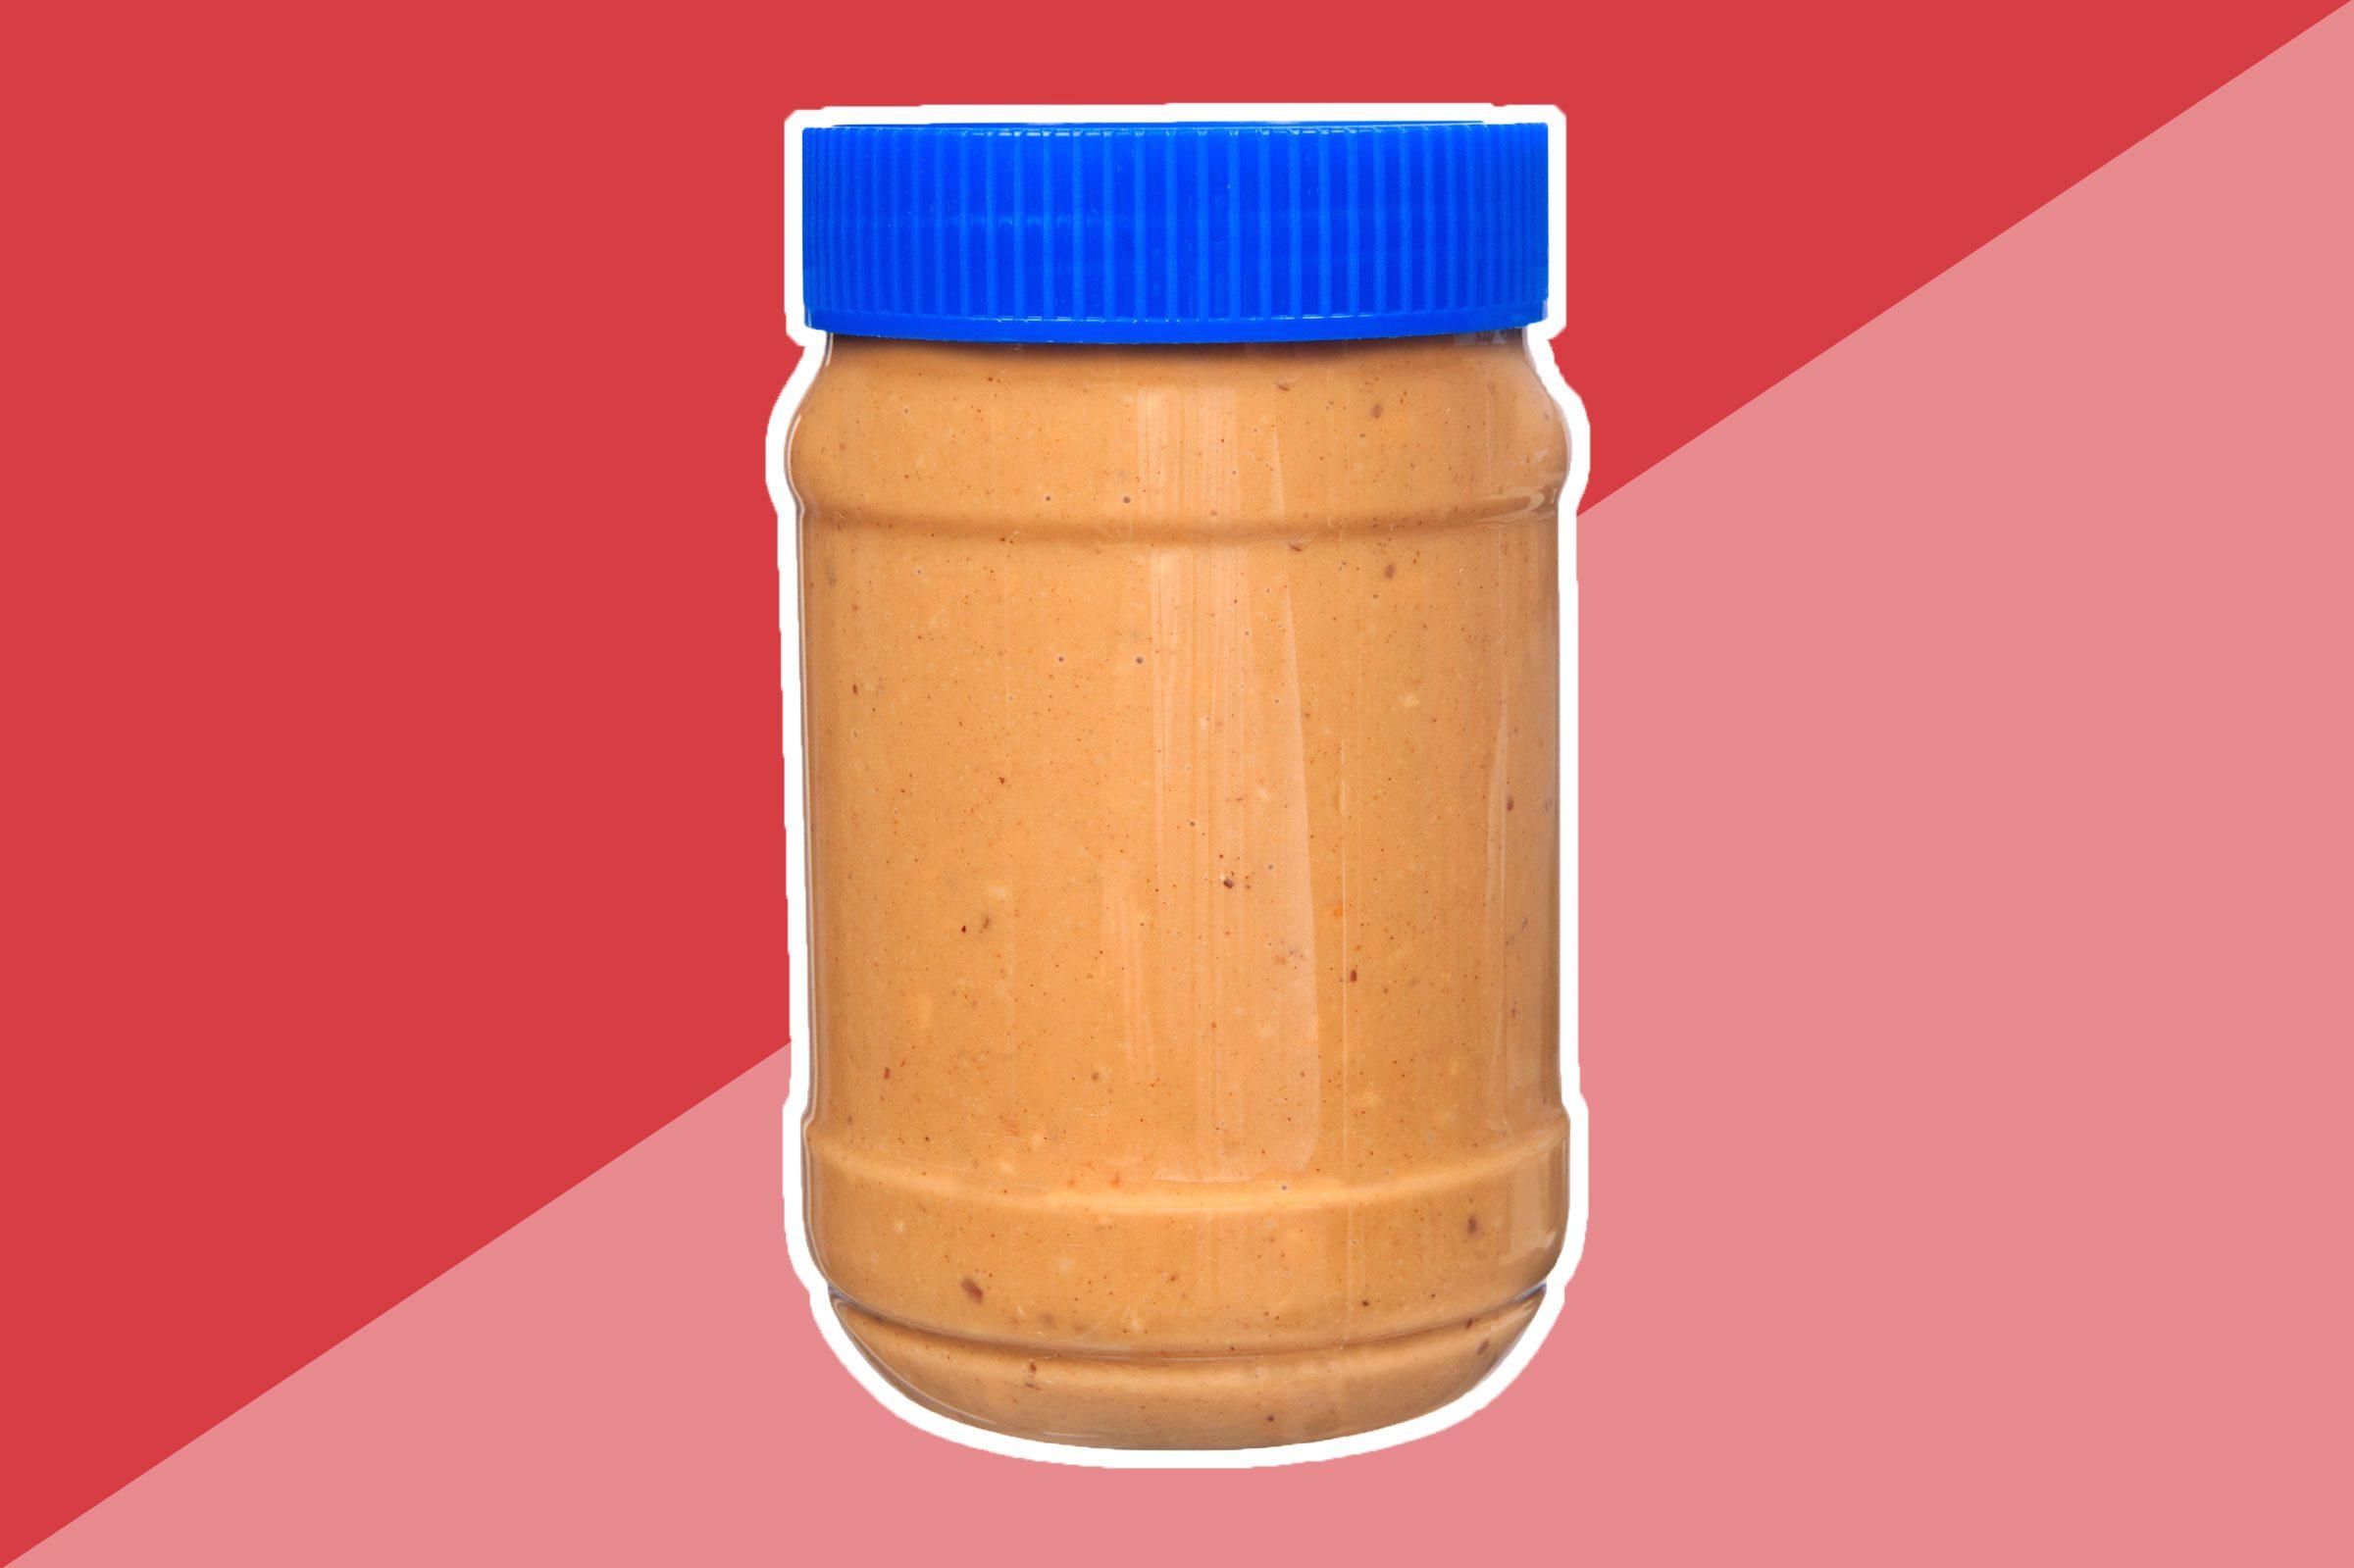 Reduced fat peanut butter